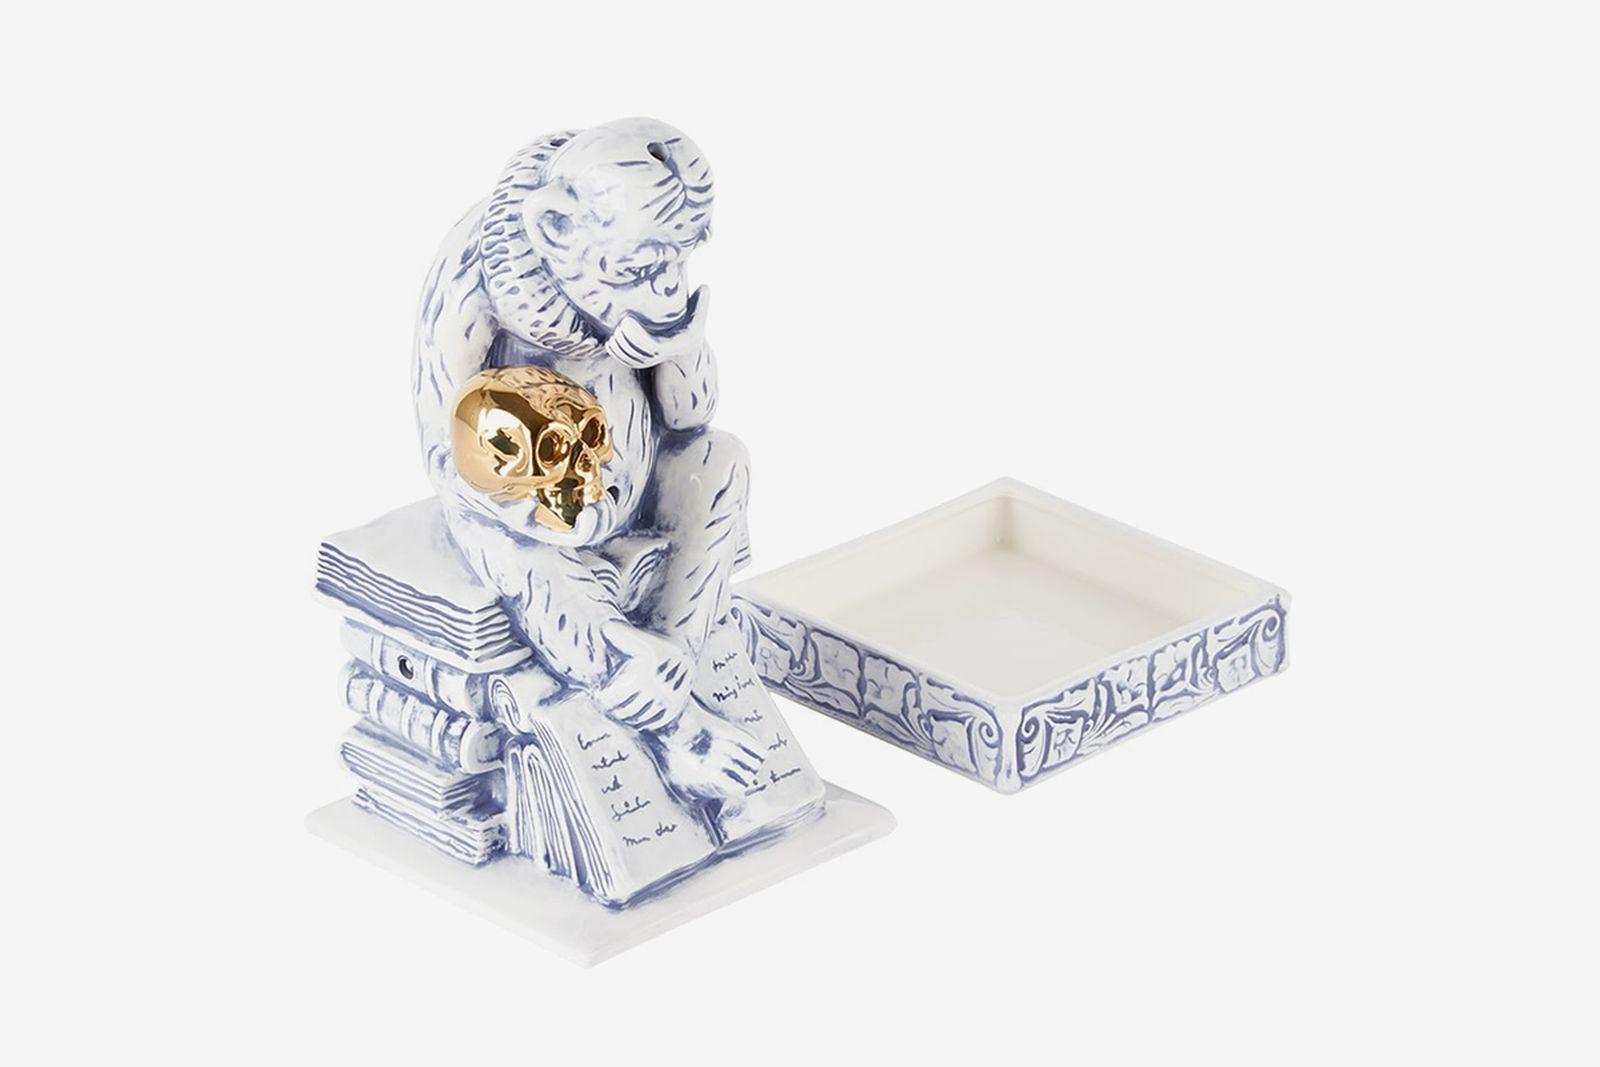 neighborhood-white-and-blue-booze-incense-chamber